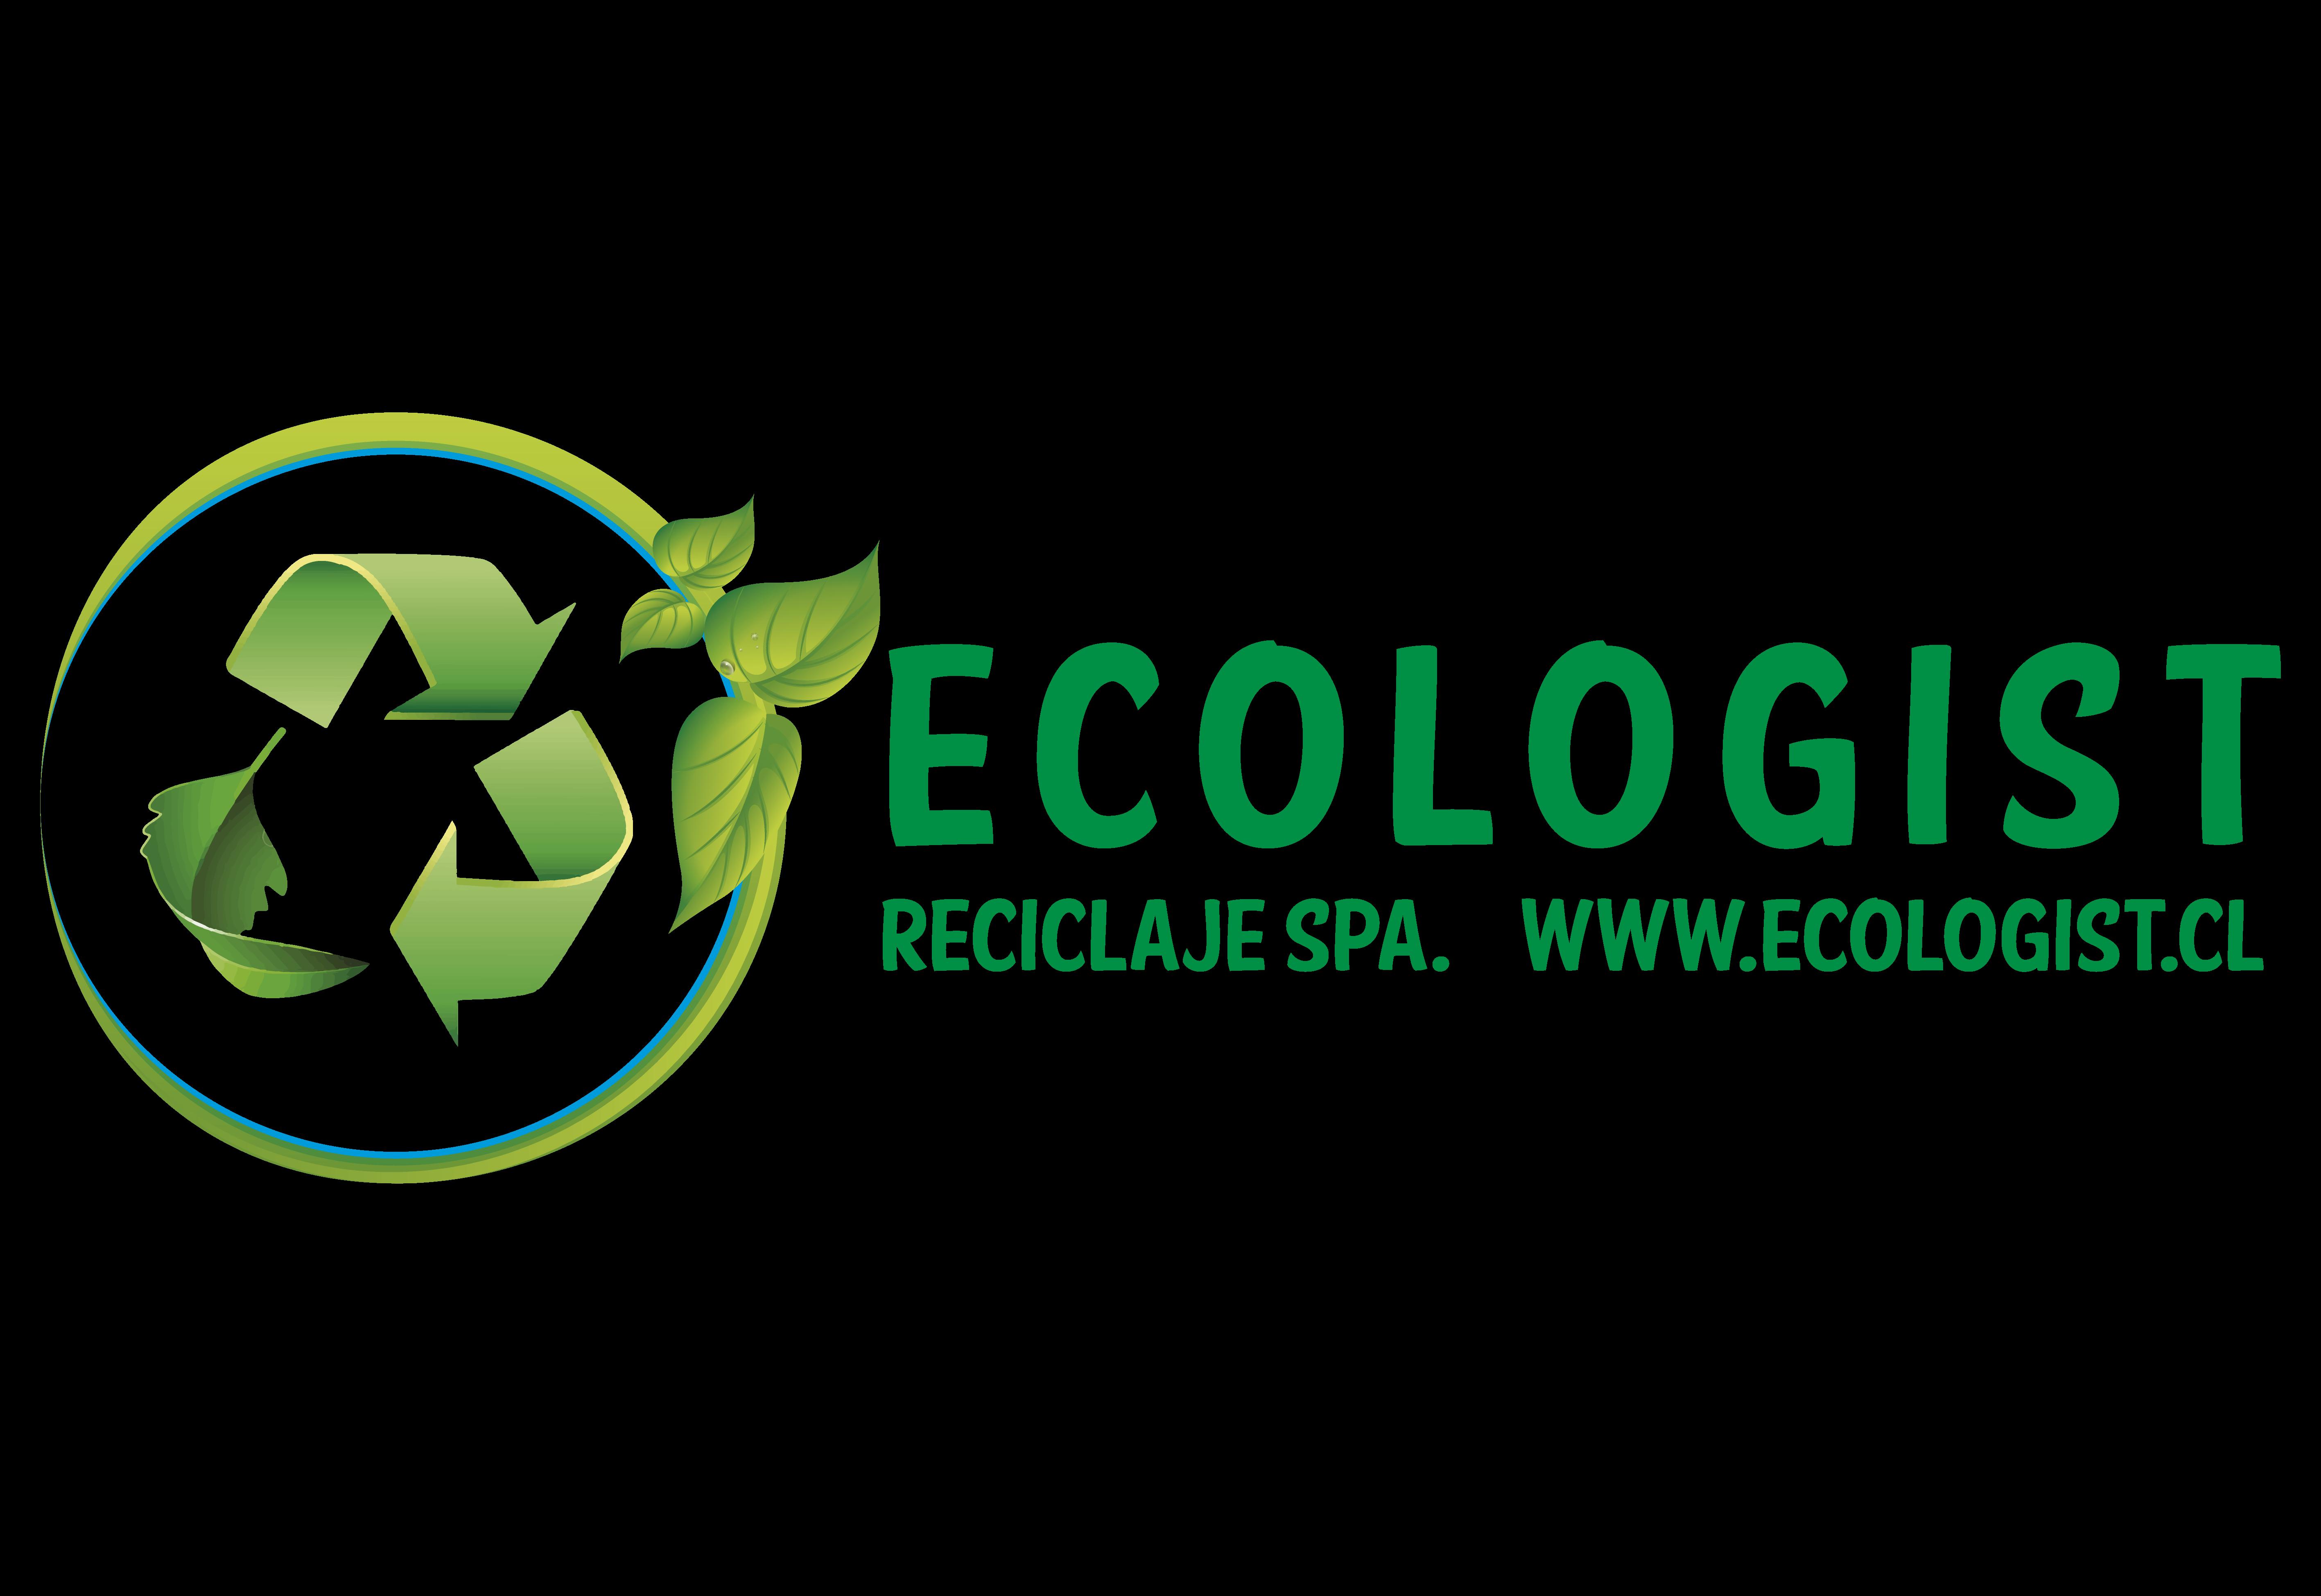 logo ecologist transparente png